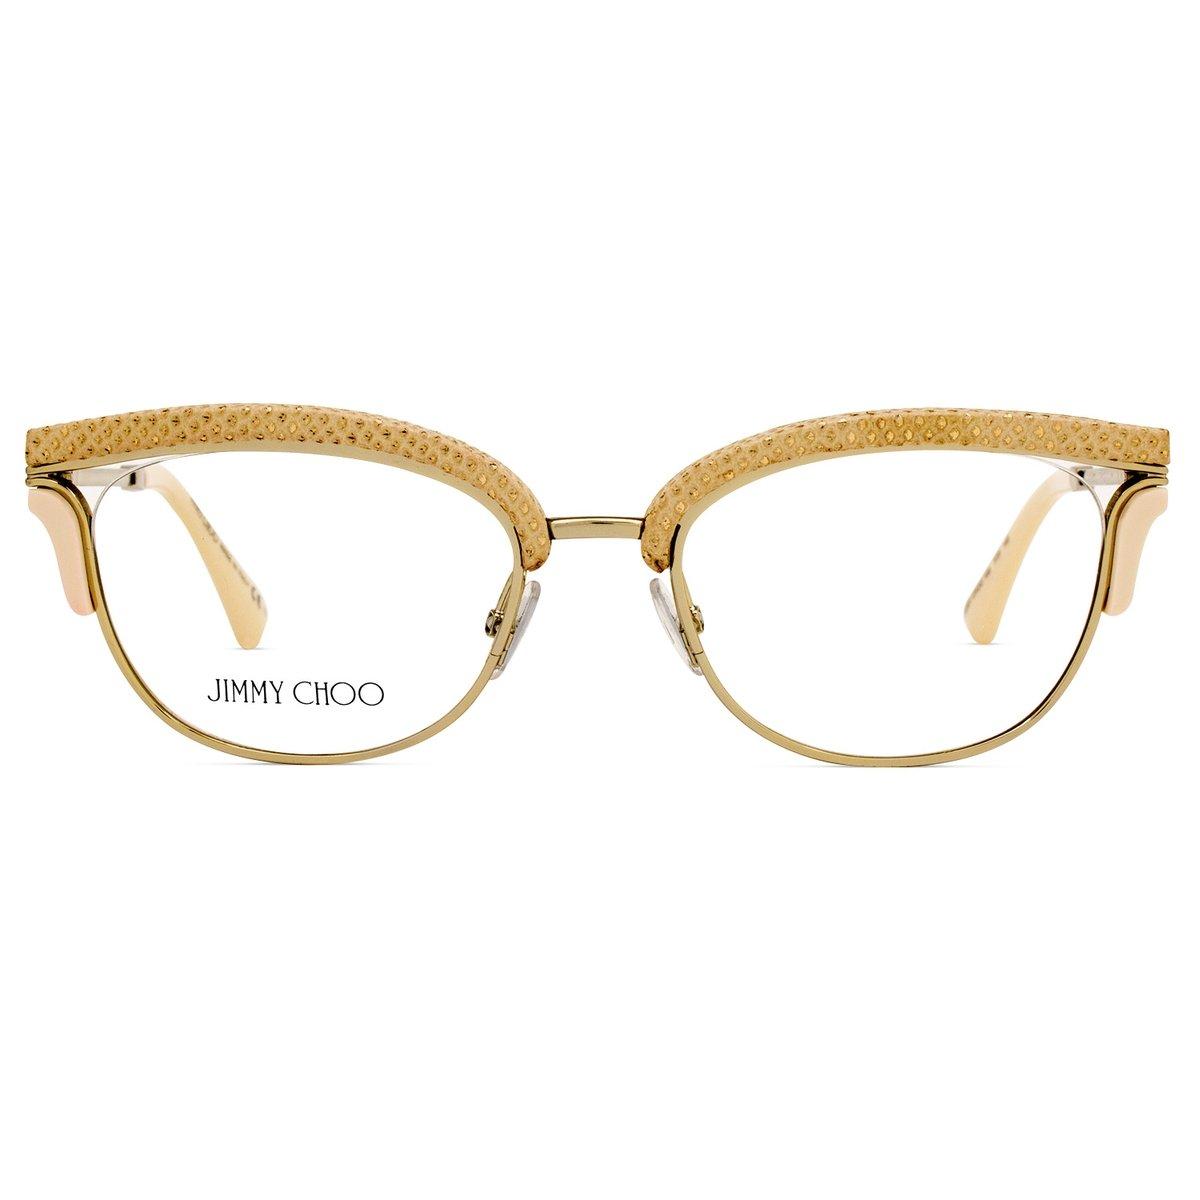 Armação Óculos de Grau Jimmy Choo JC169 PTF-50 - Compre Agora   Zattini 3f67117f00